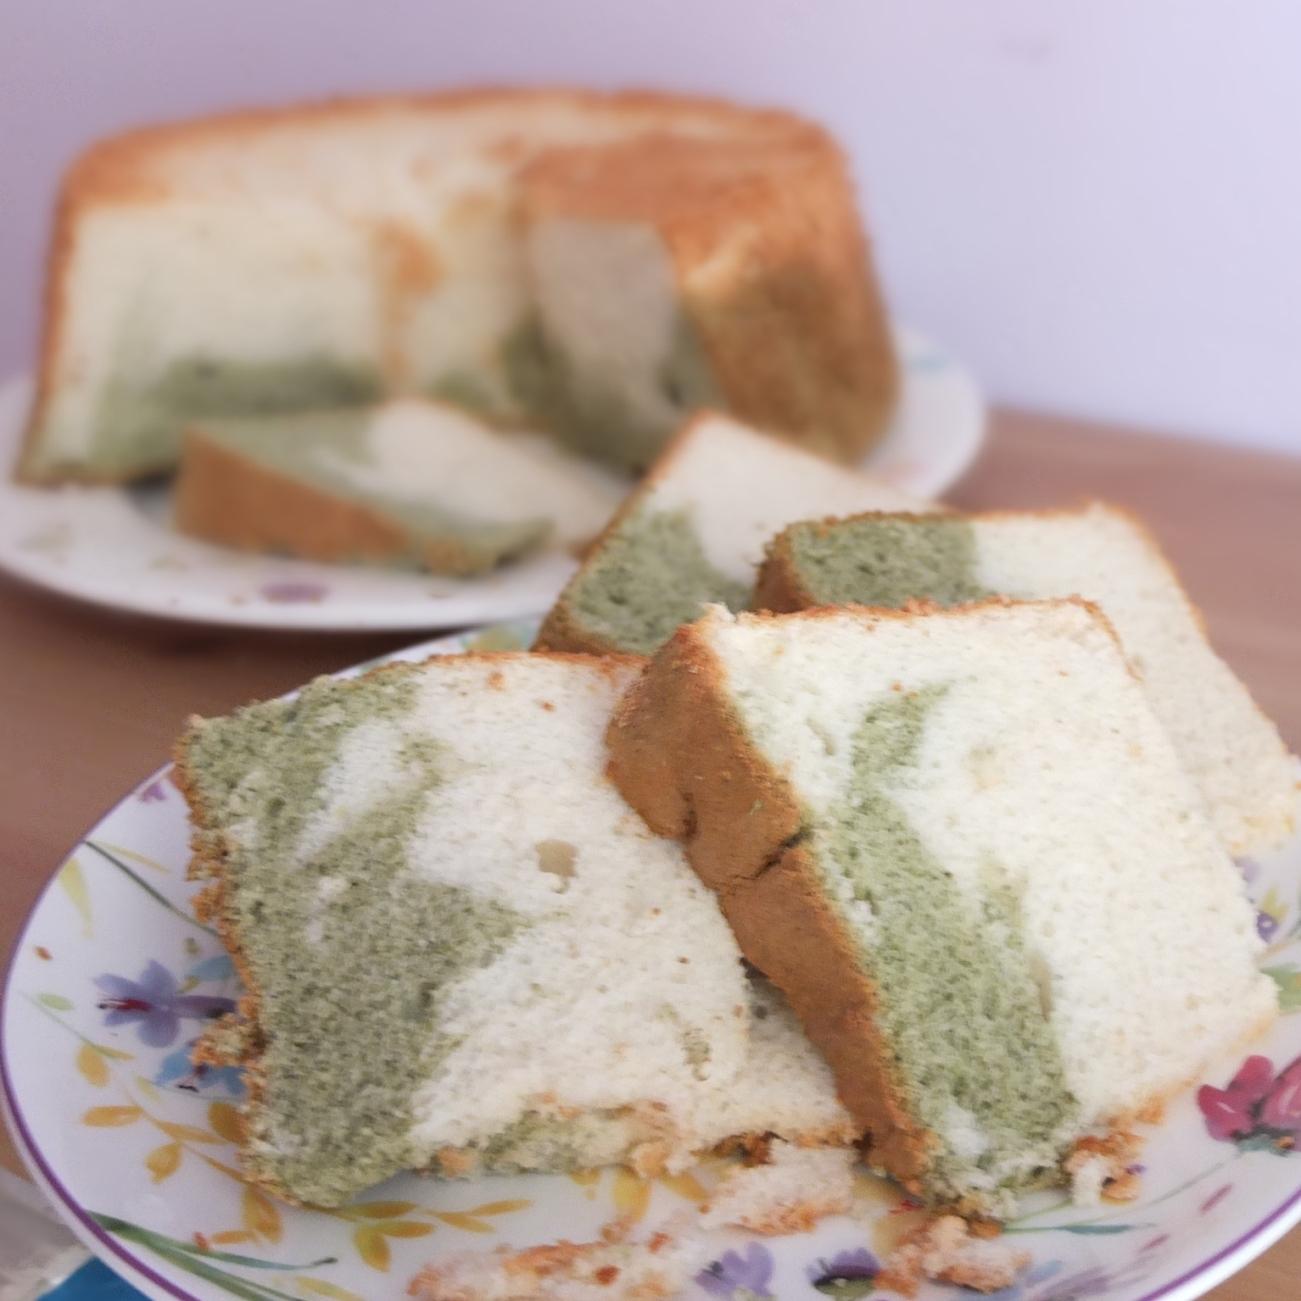 Matcha and vanilla angel food cake